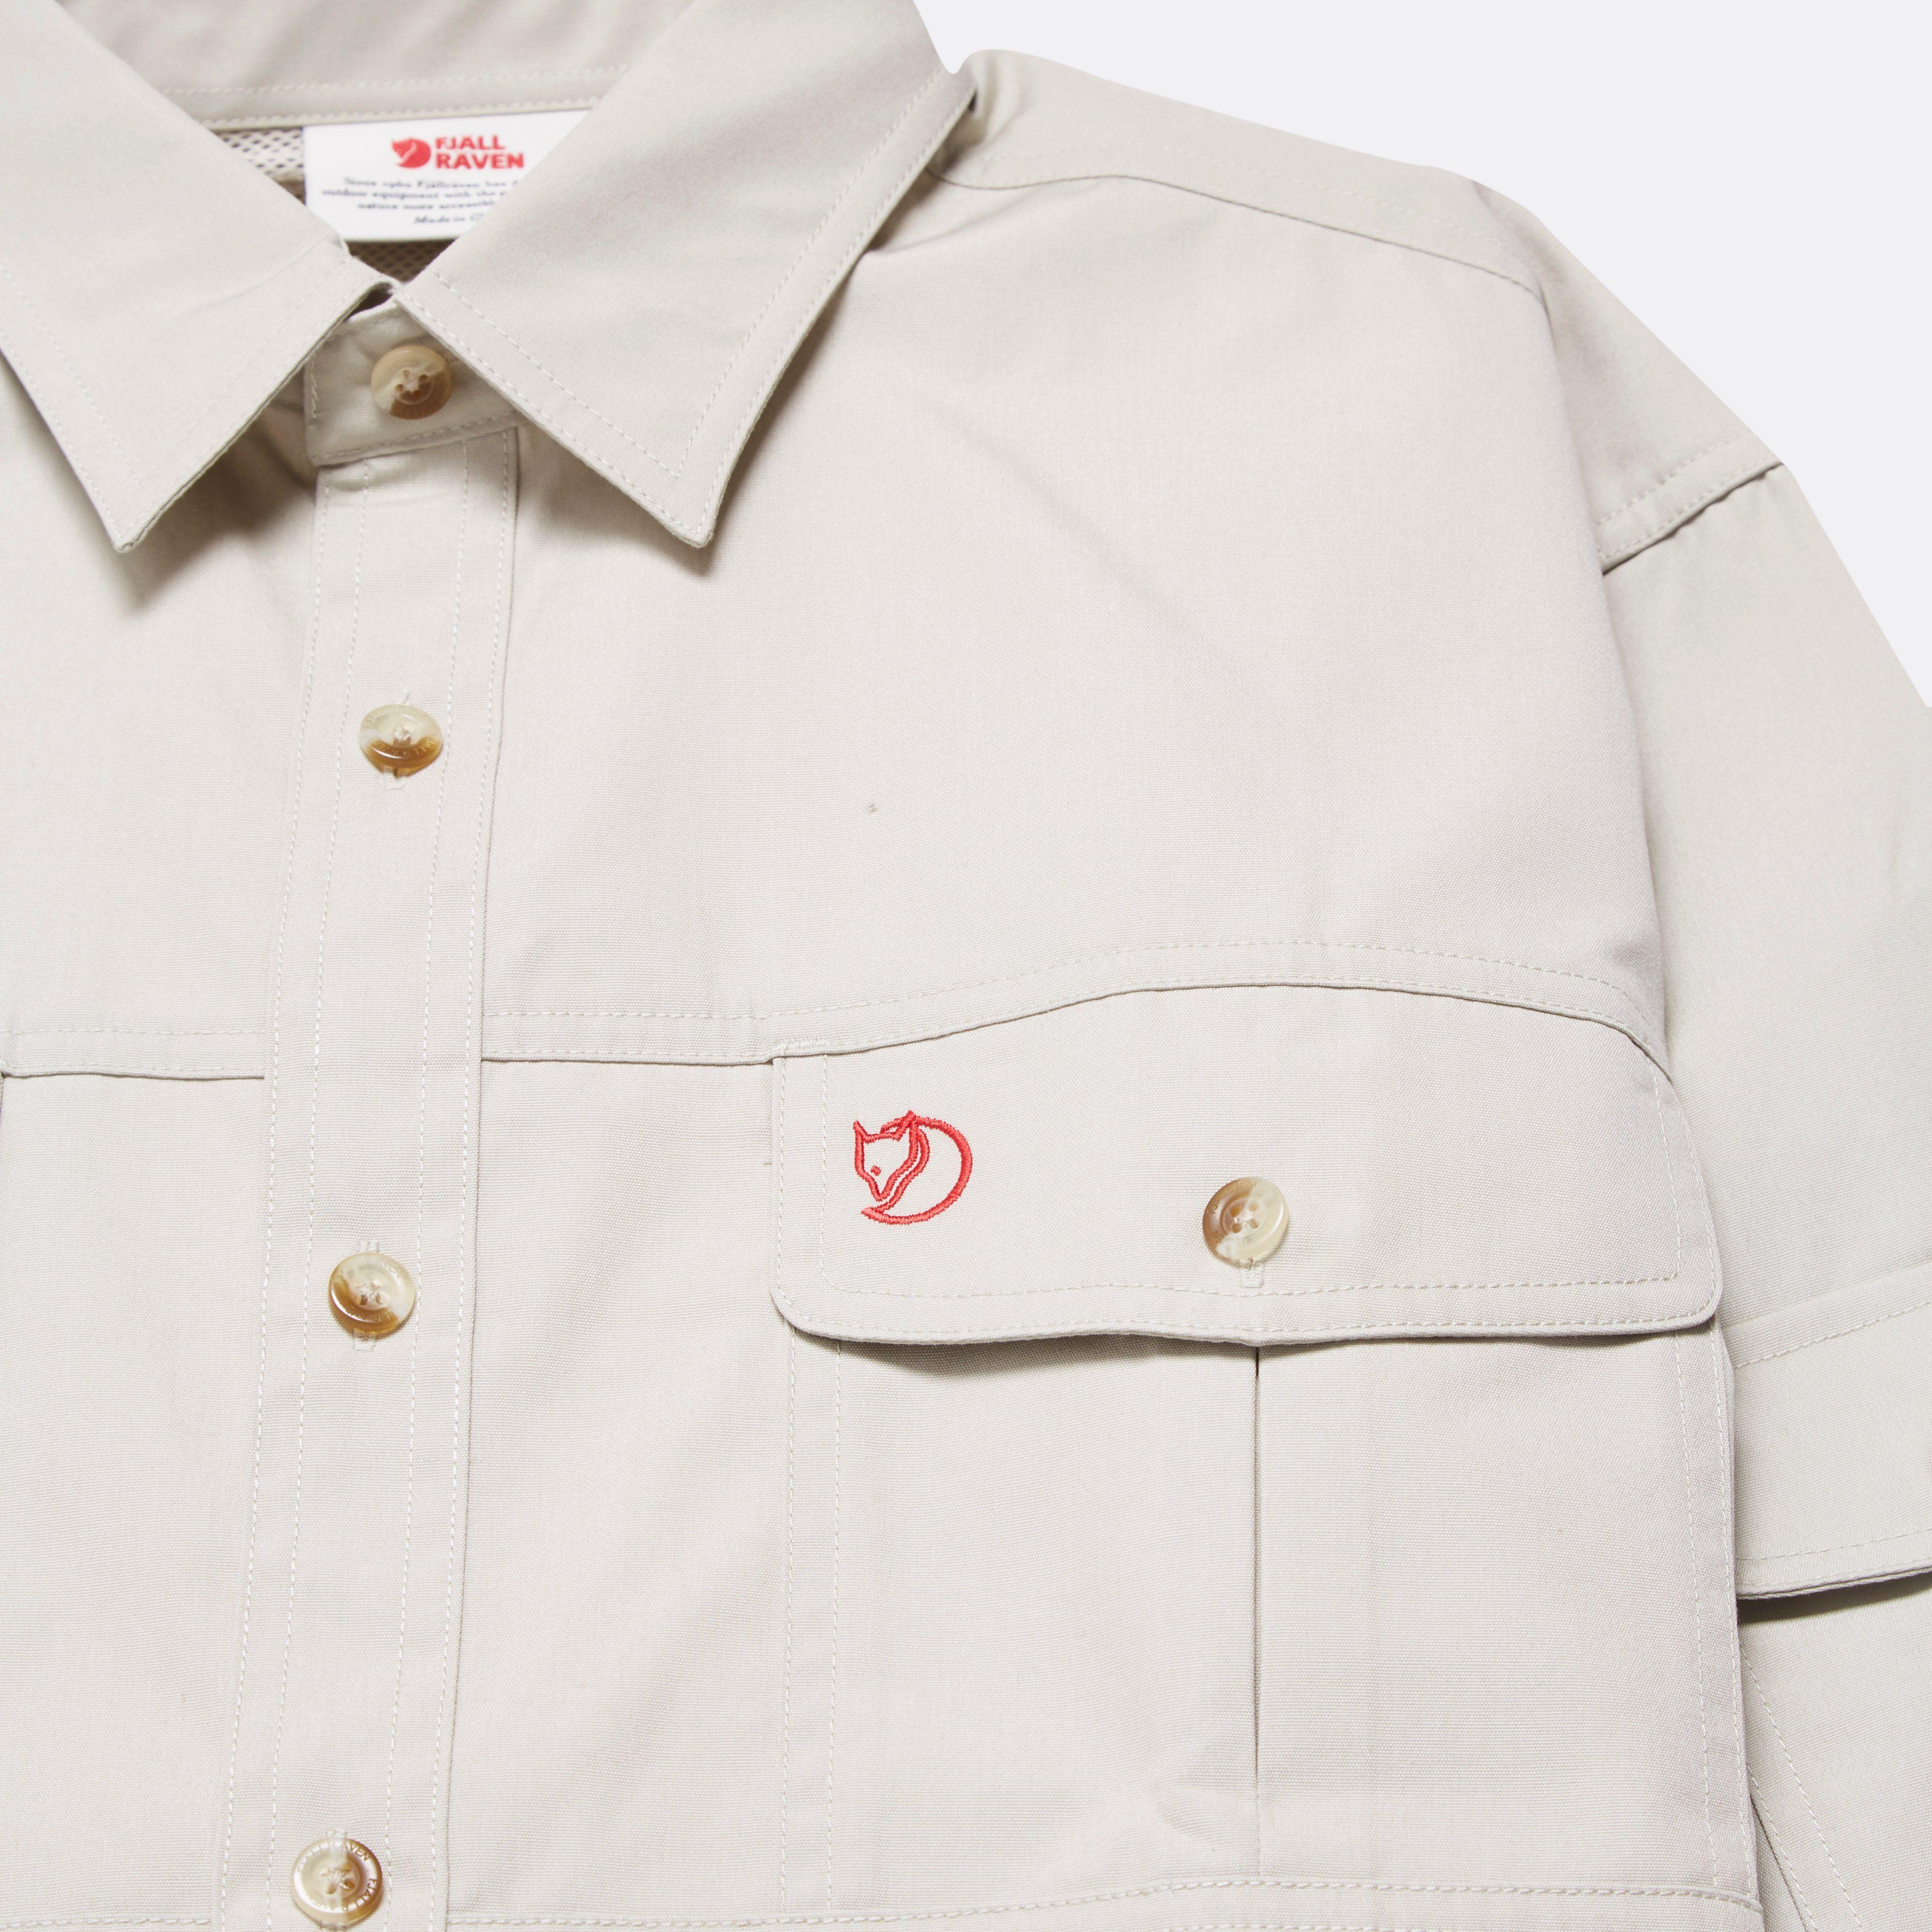 Fjallraven Singi Trekking Shirt